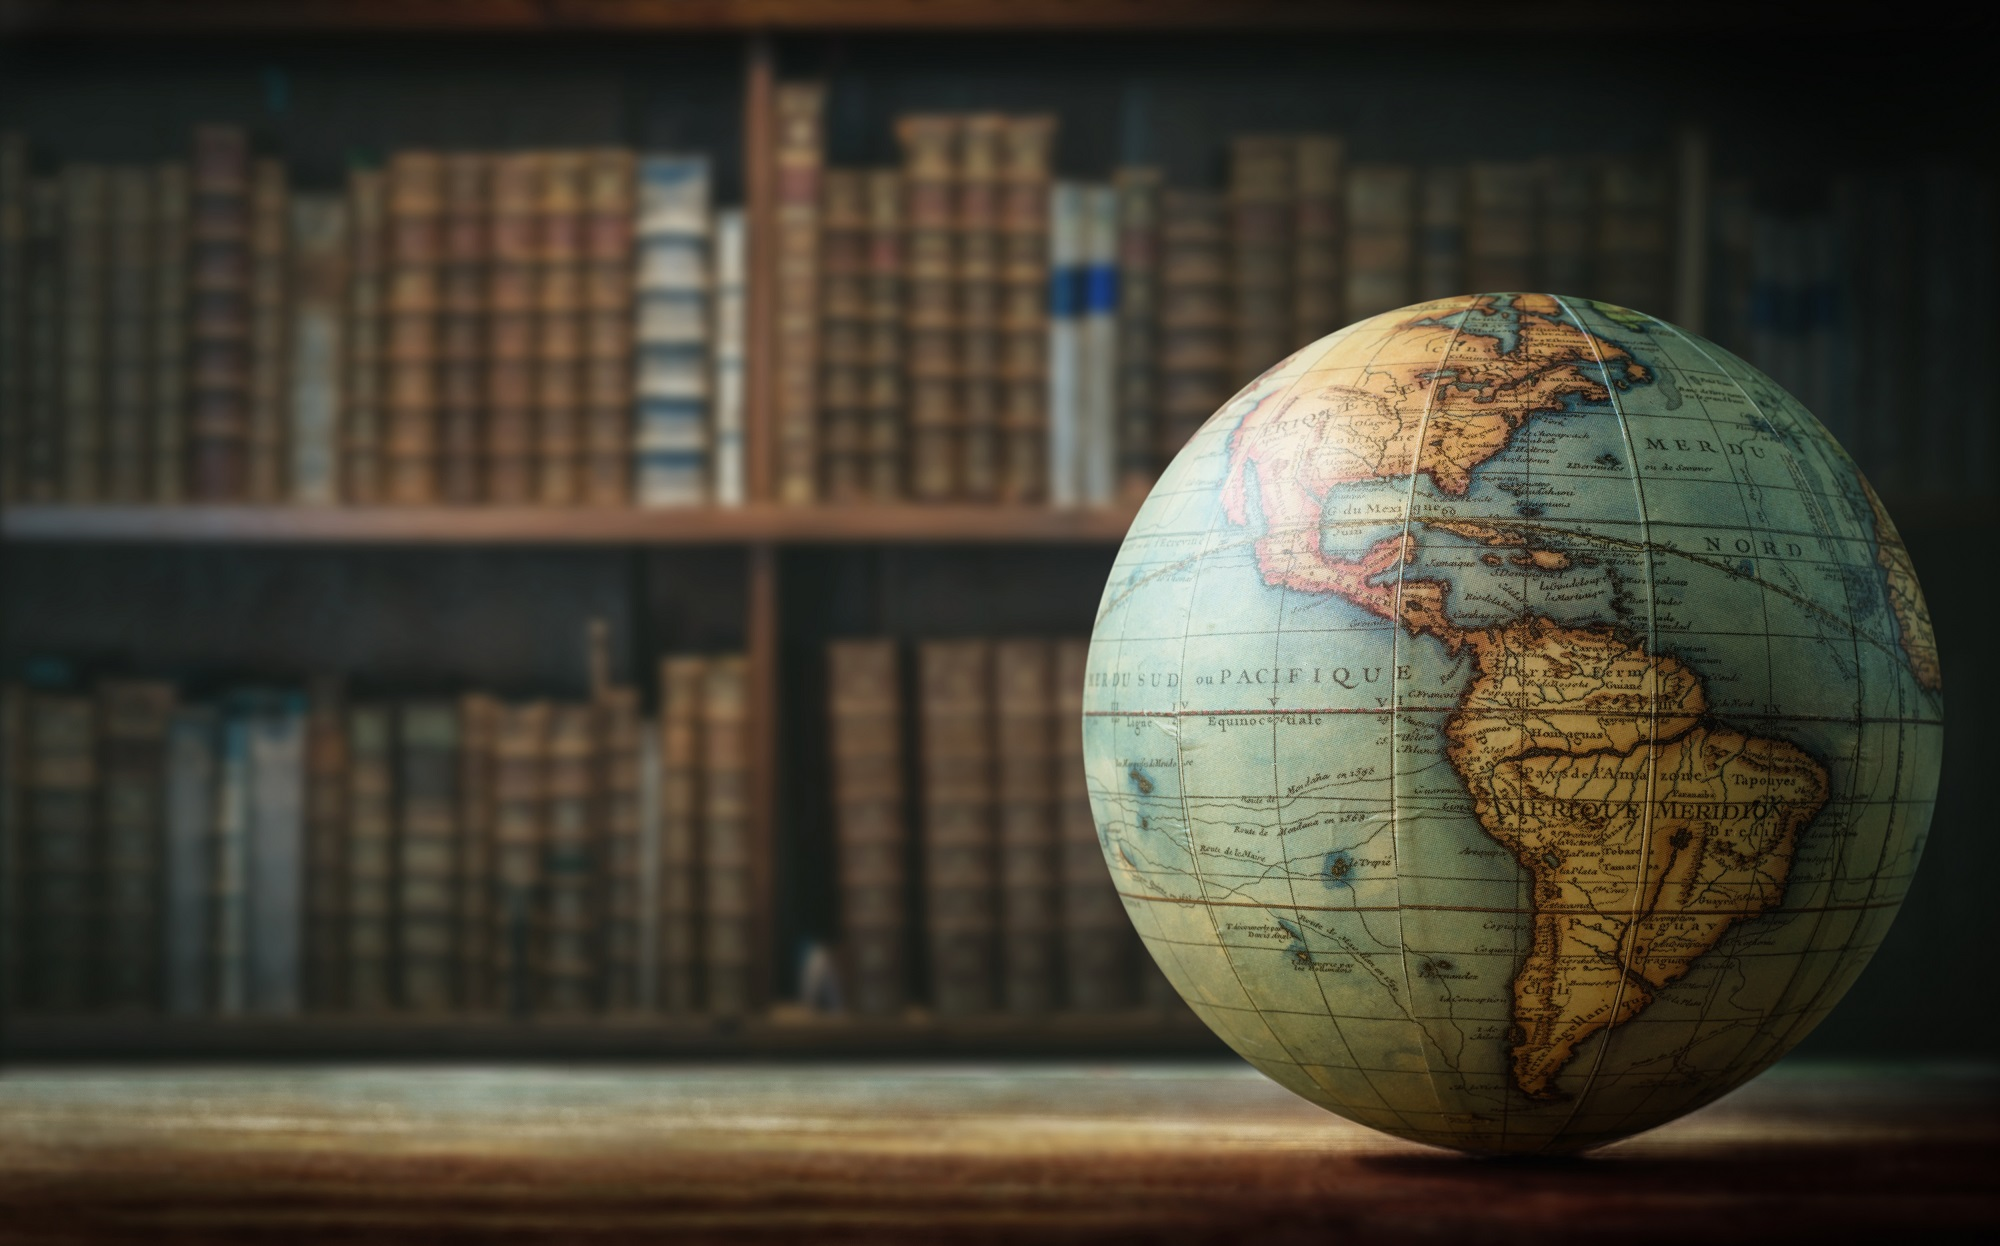 Globe and bookshelves